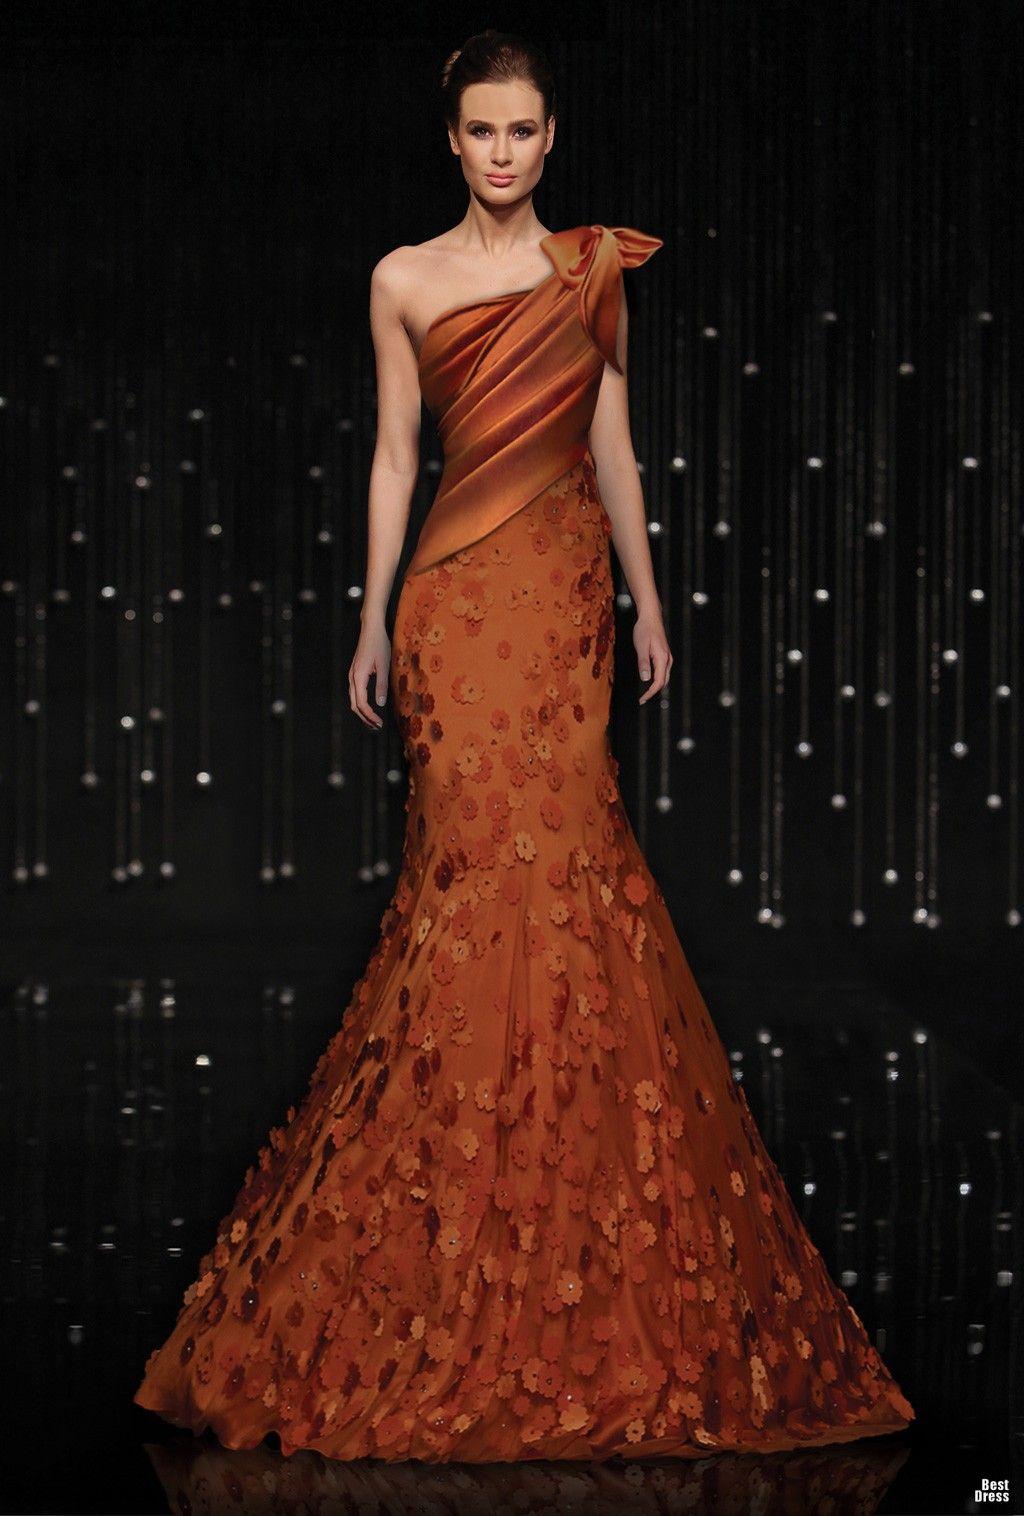 Armaniu that is a beautiful dress style pinterest chic chic